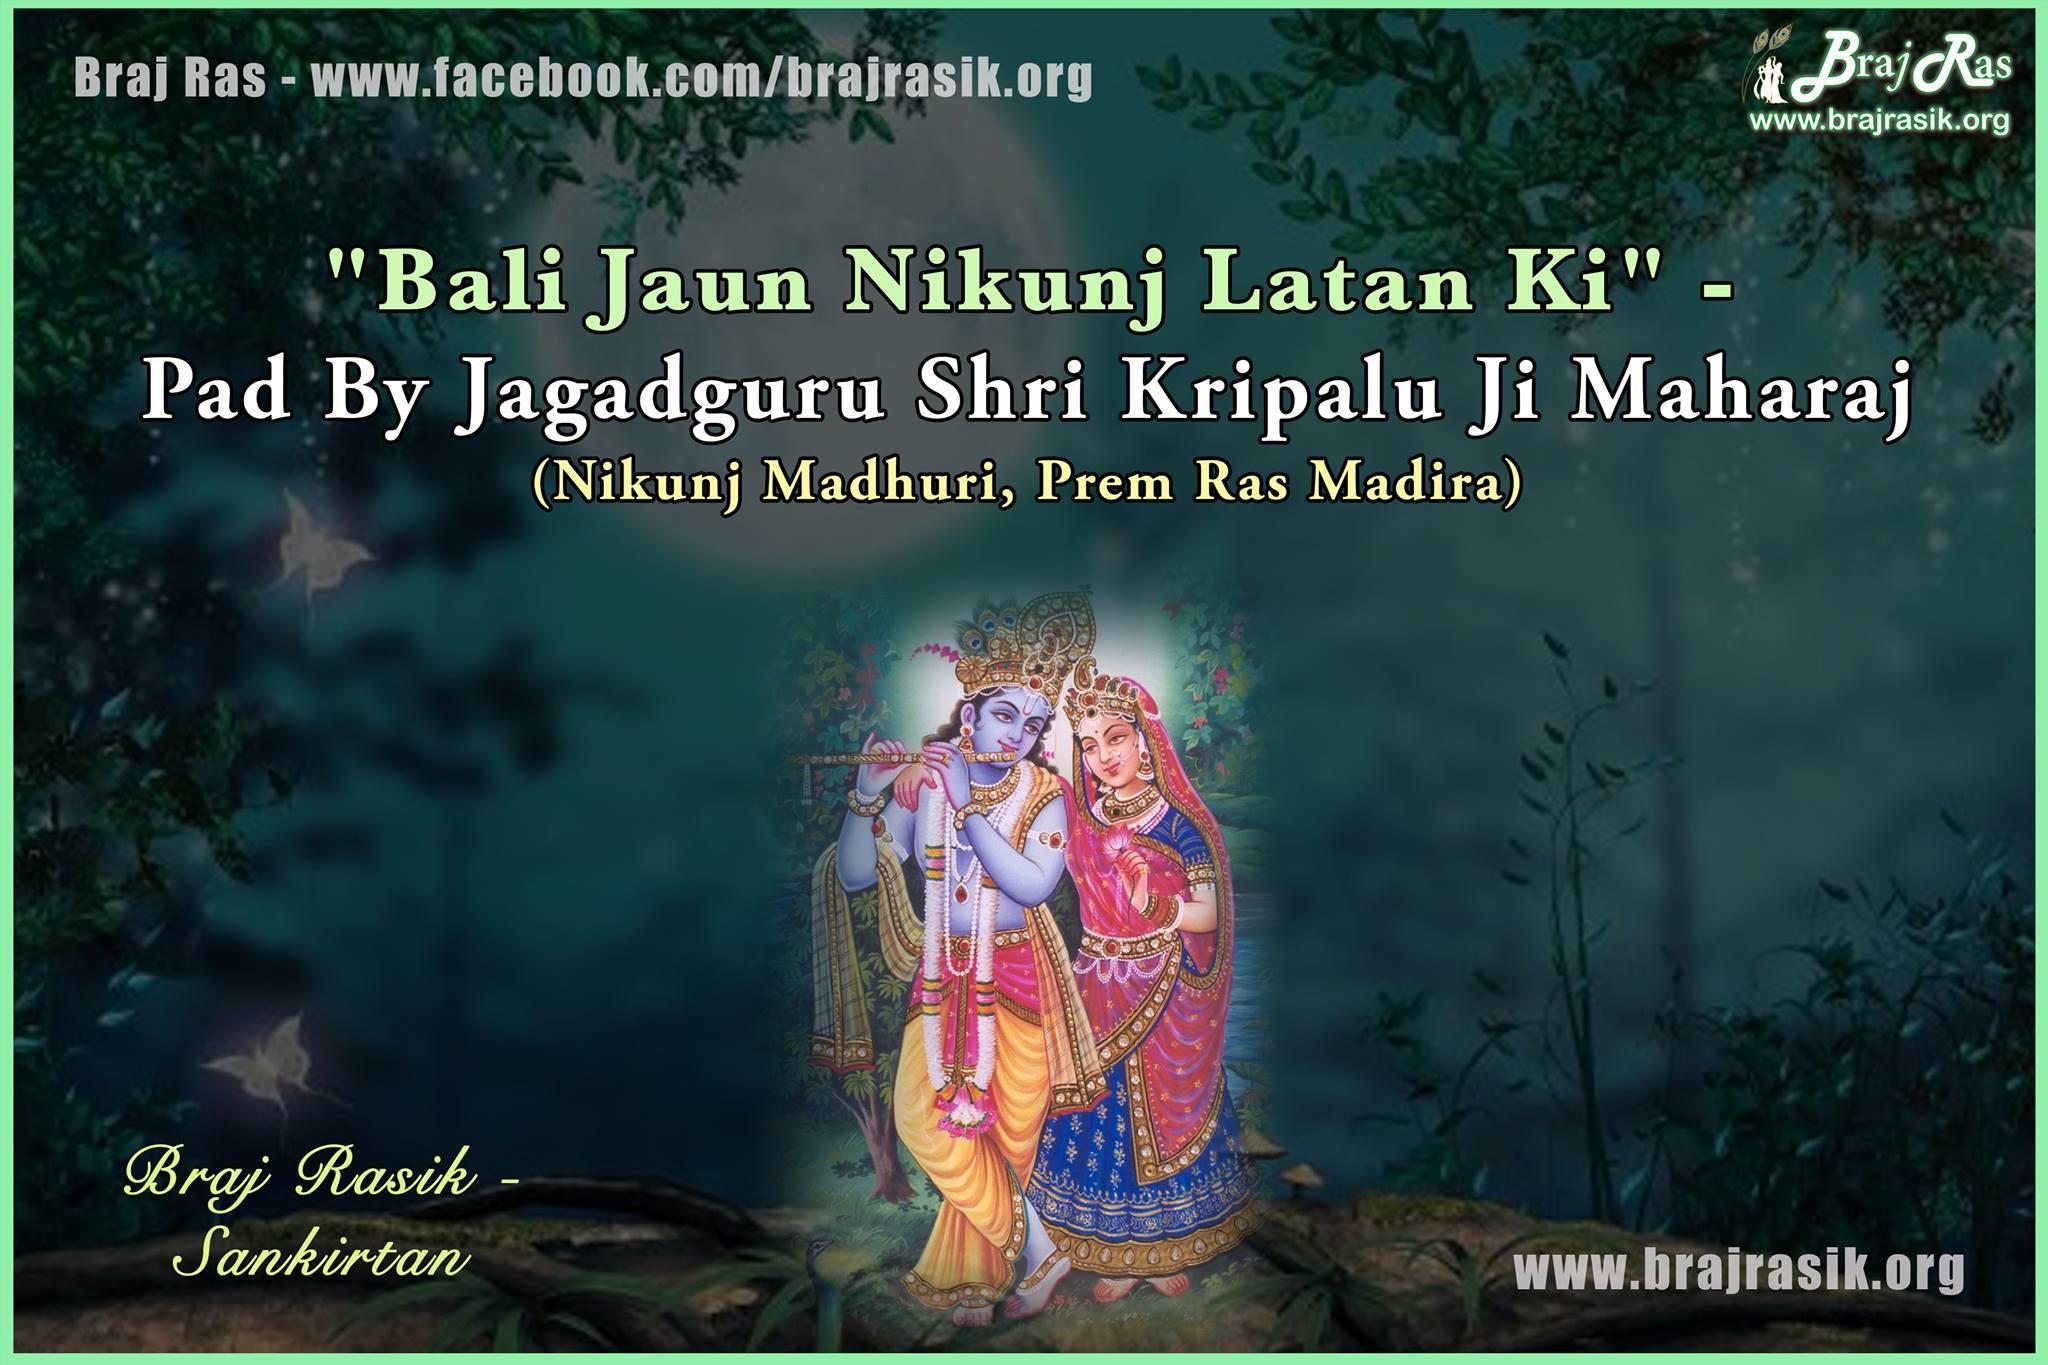 Bali Jaun Nikunj Latan Ki - Jagadguru Shri Kripalu Ji Maharaj (Nikunj Madhuri, Prem Ras Madira)